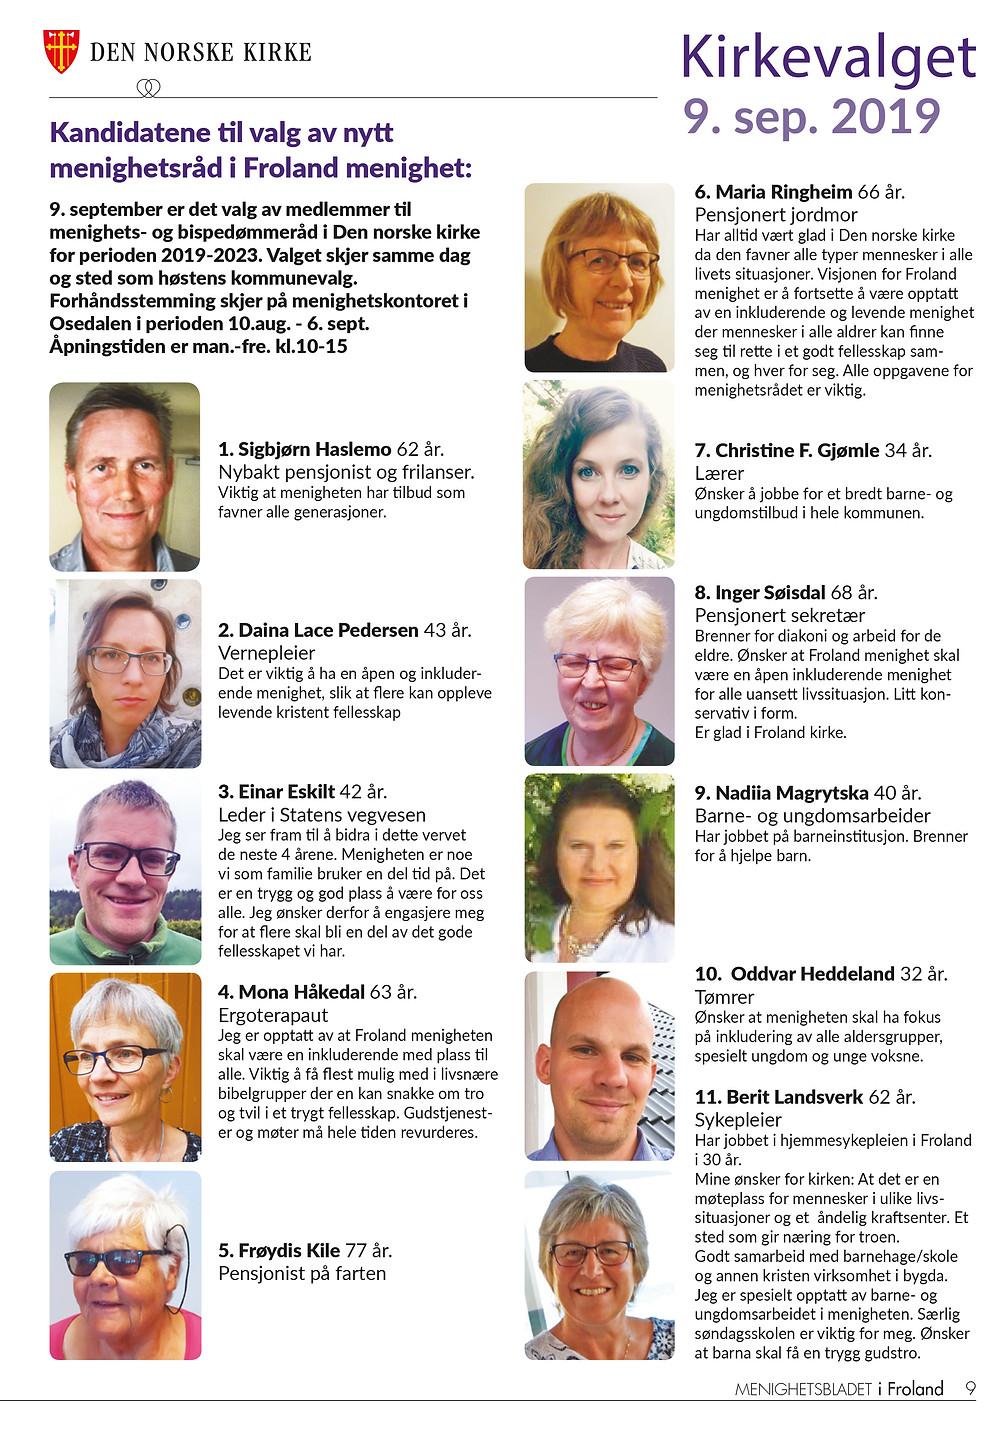 Kandidater kirkevalget